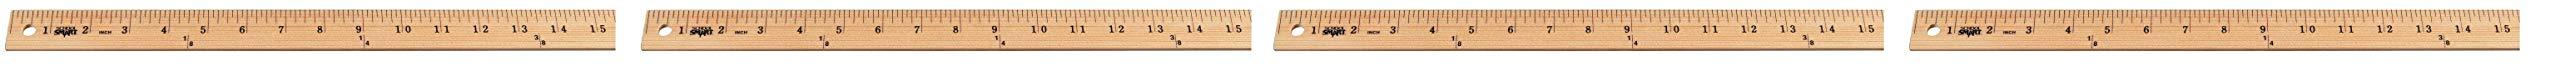 School Smart Wood Yardstick, Plain Ends, 36 Inches, Natural (Fоur Paсk)